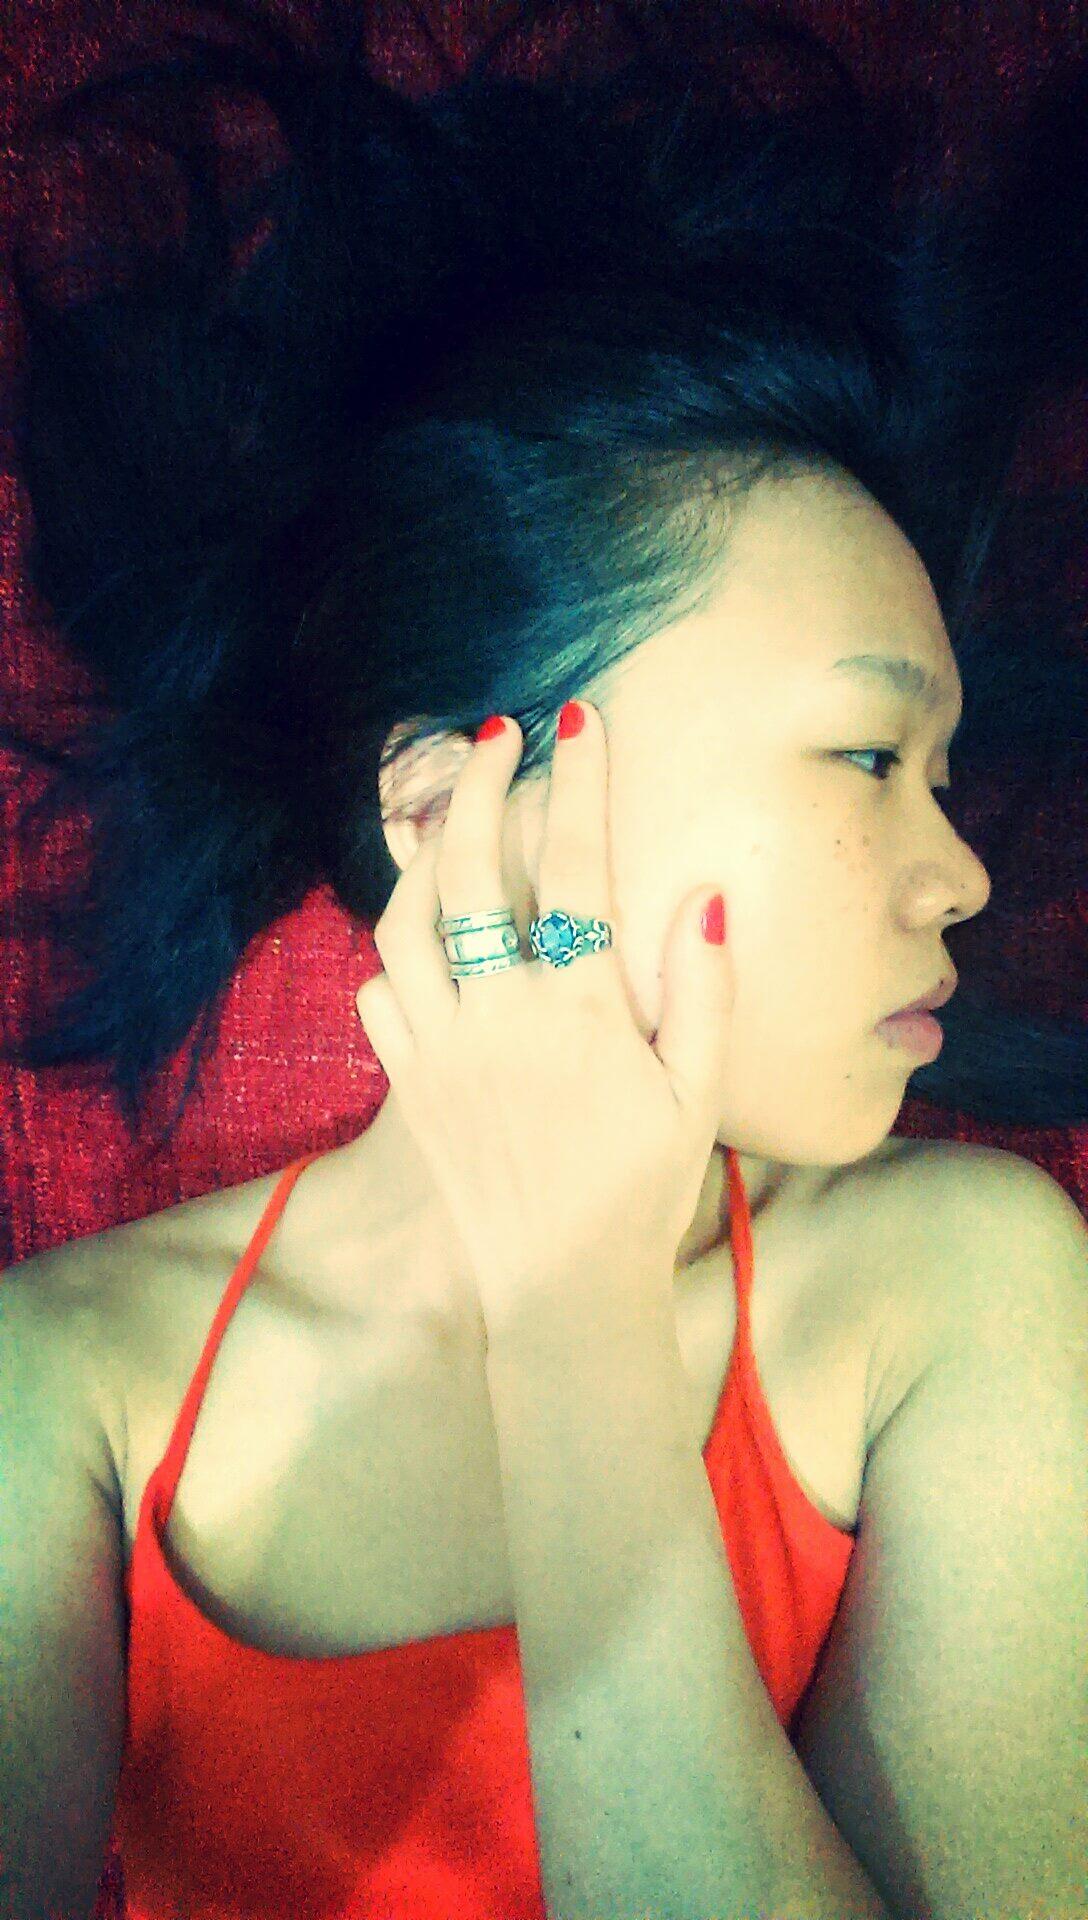 [JC]CREATIVE 女性攝影師   自拍 攝影教學 SELFIE 藝術自拍   尋嚐 TAIWAN VOGUE 自然風格   圖像00005.JPG